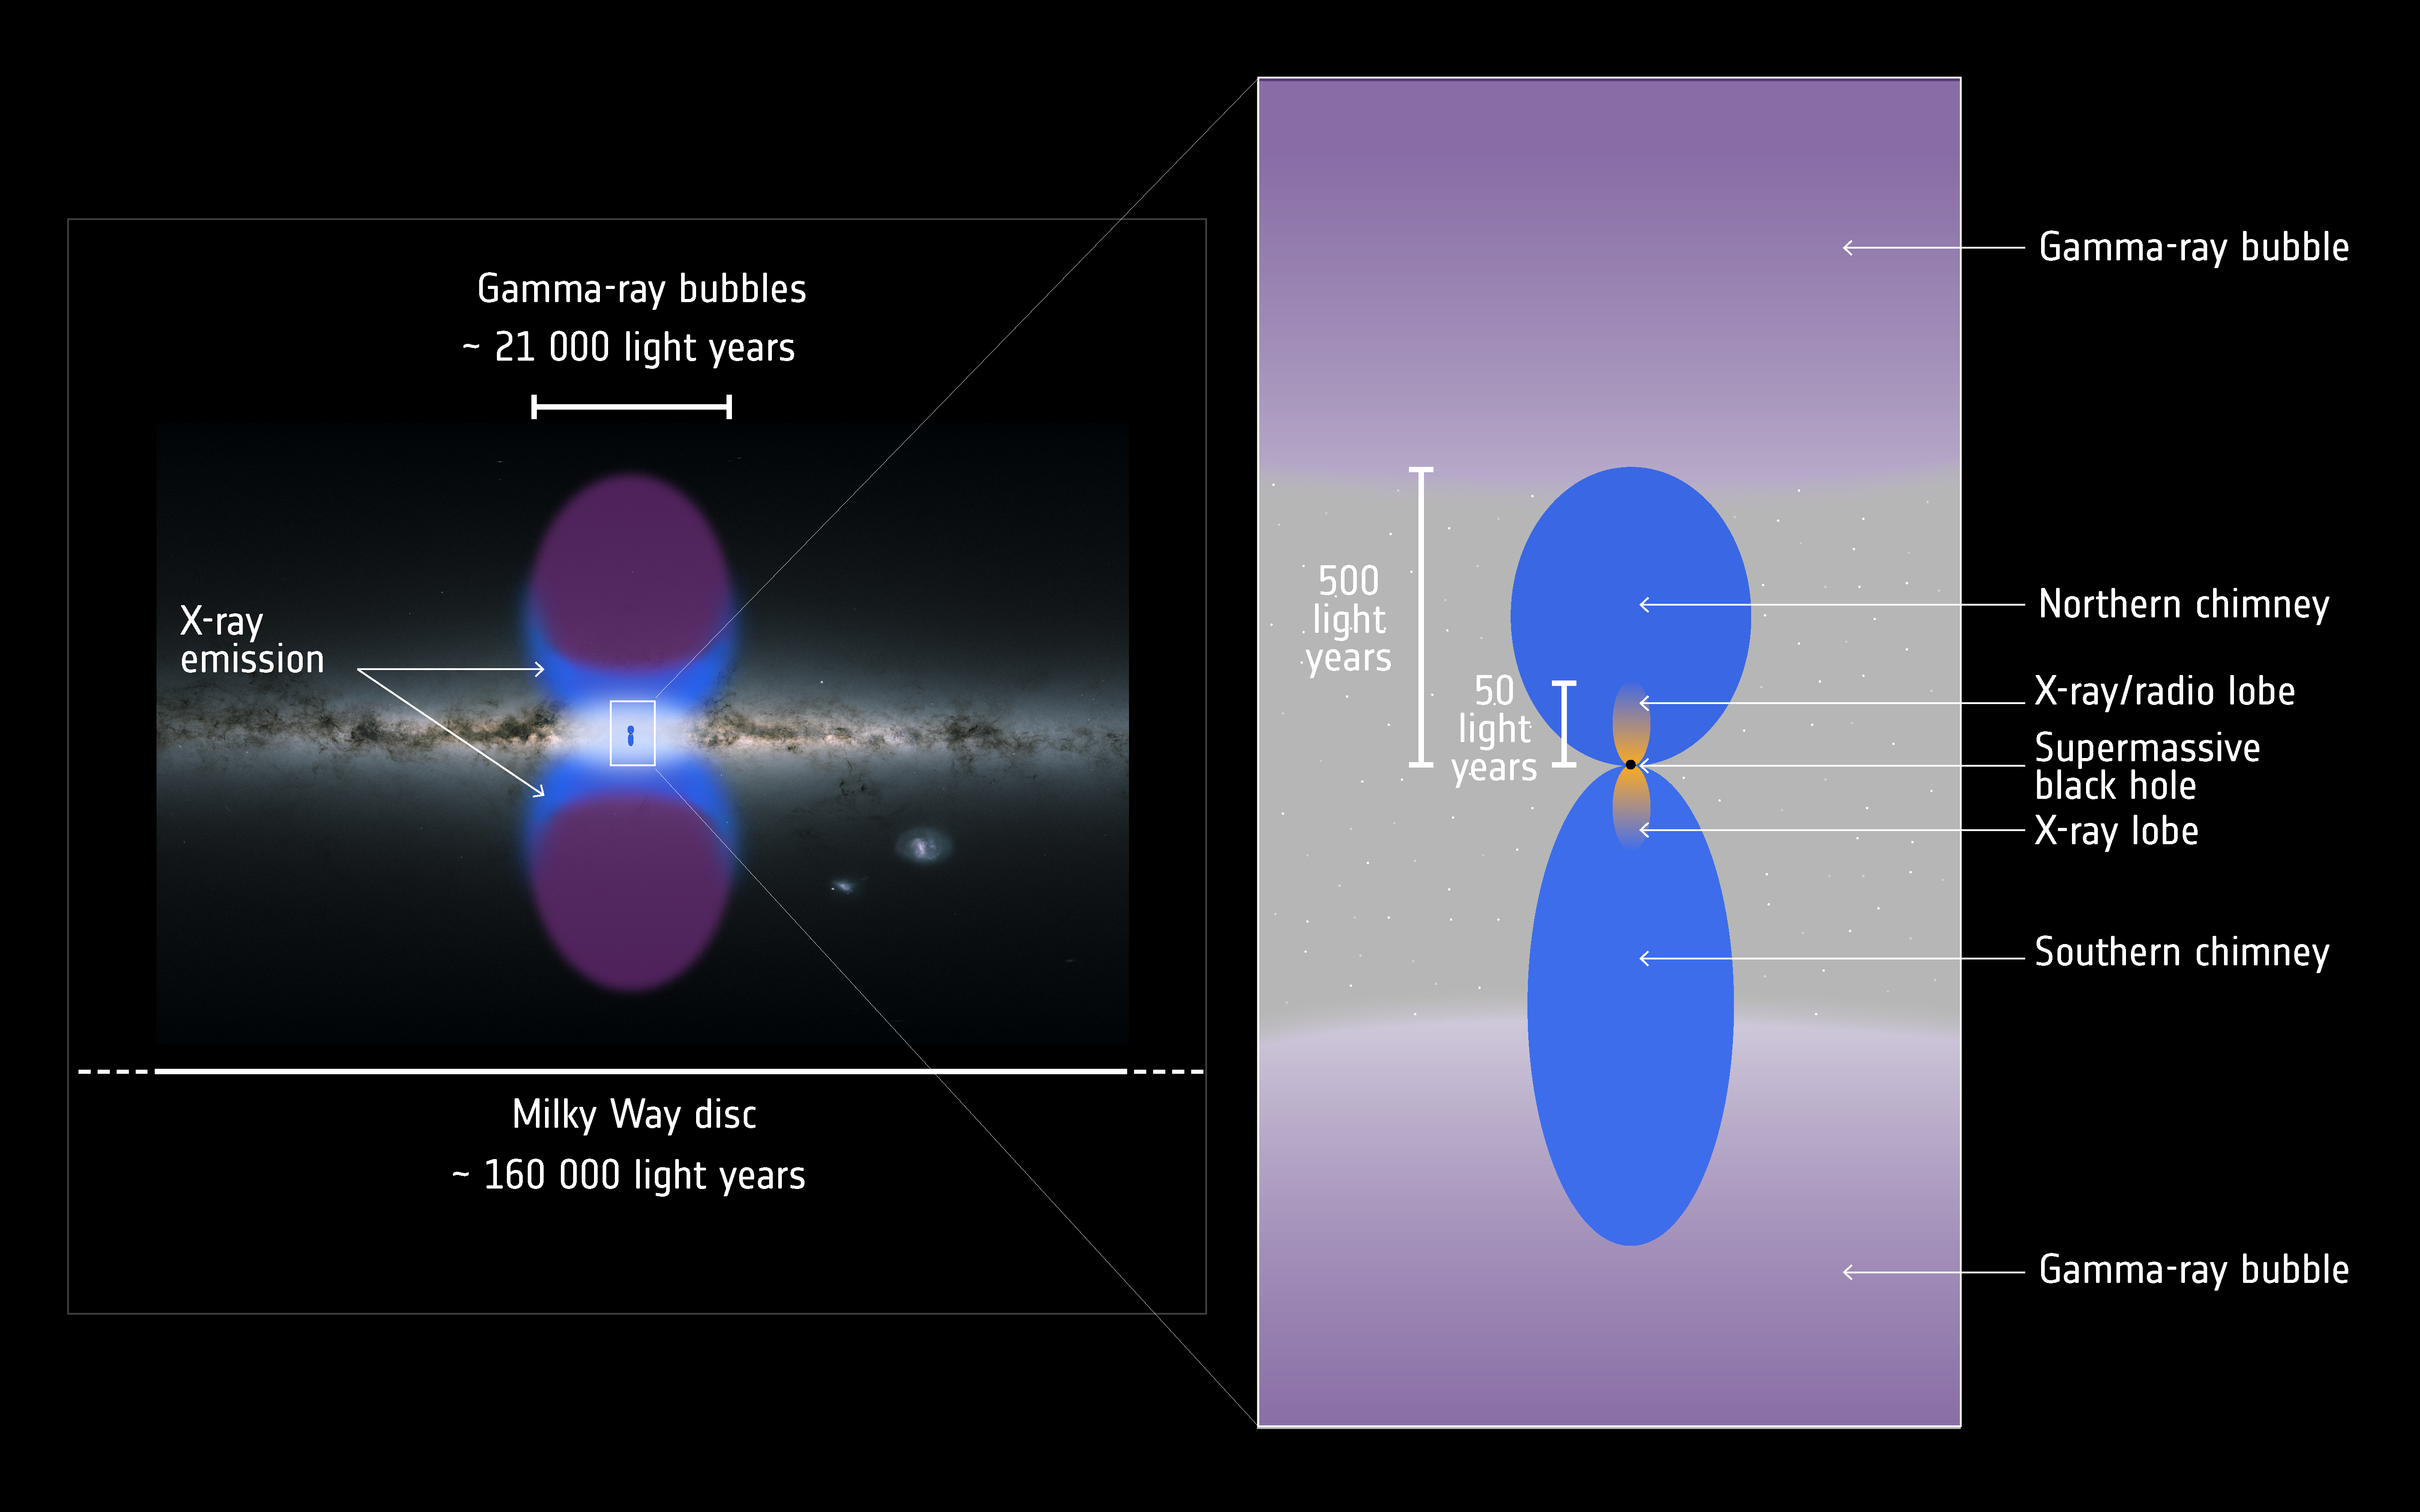 1567214262602-ESA_XMM-Newton_galactic-chimneys_illustration.jpg